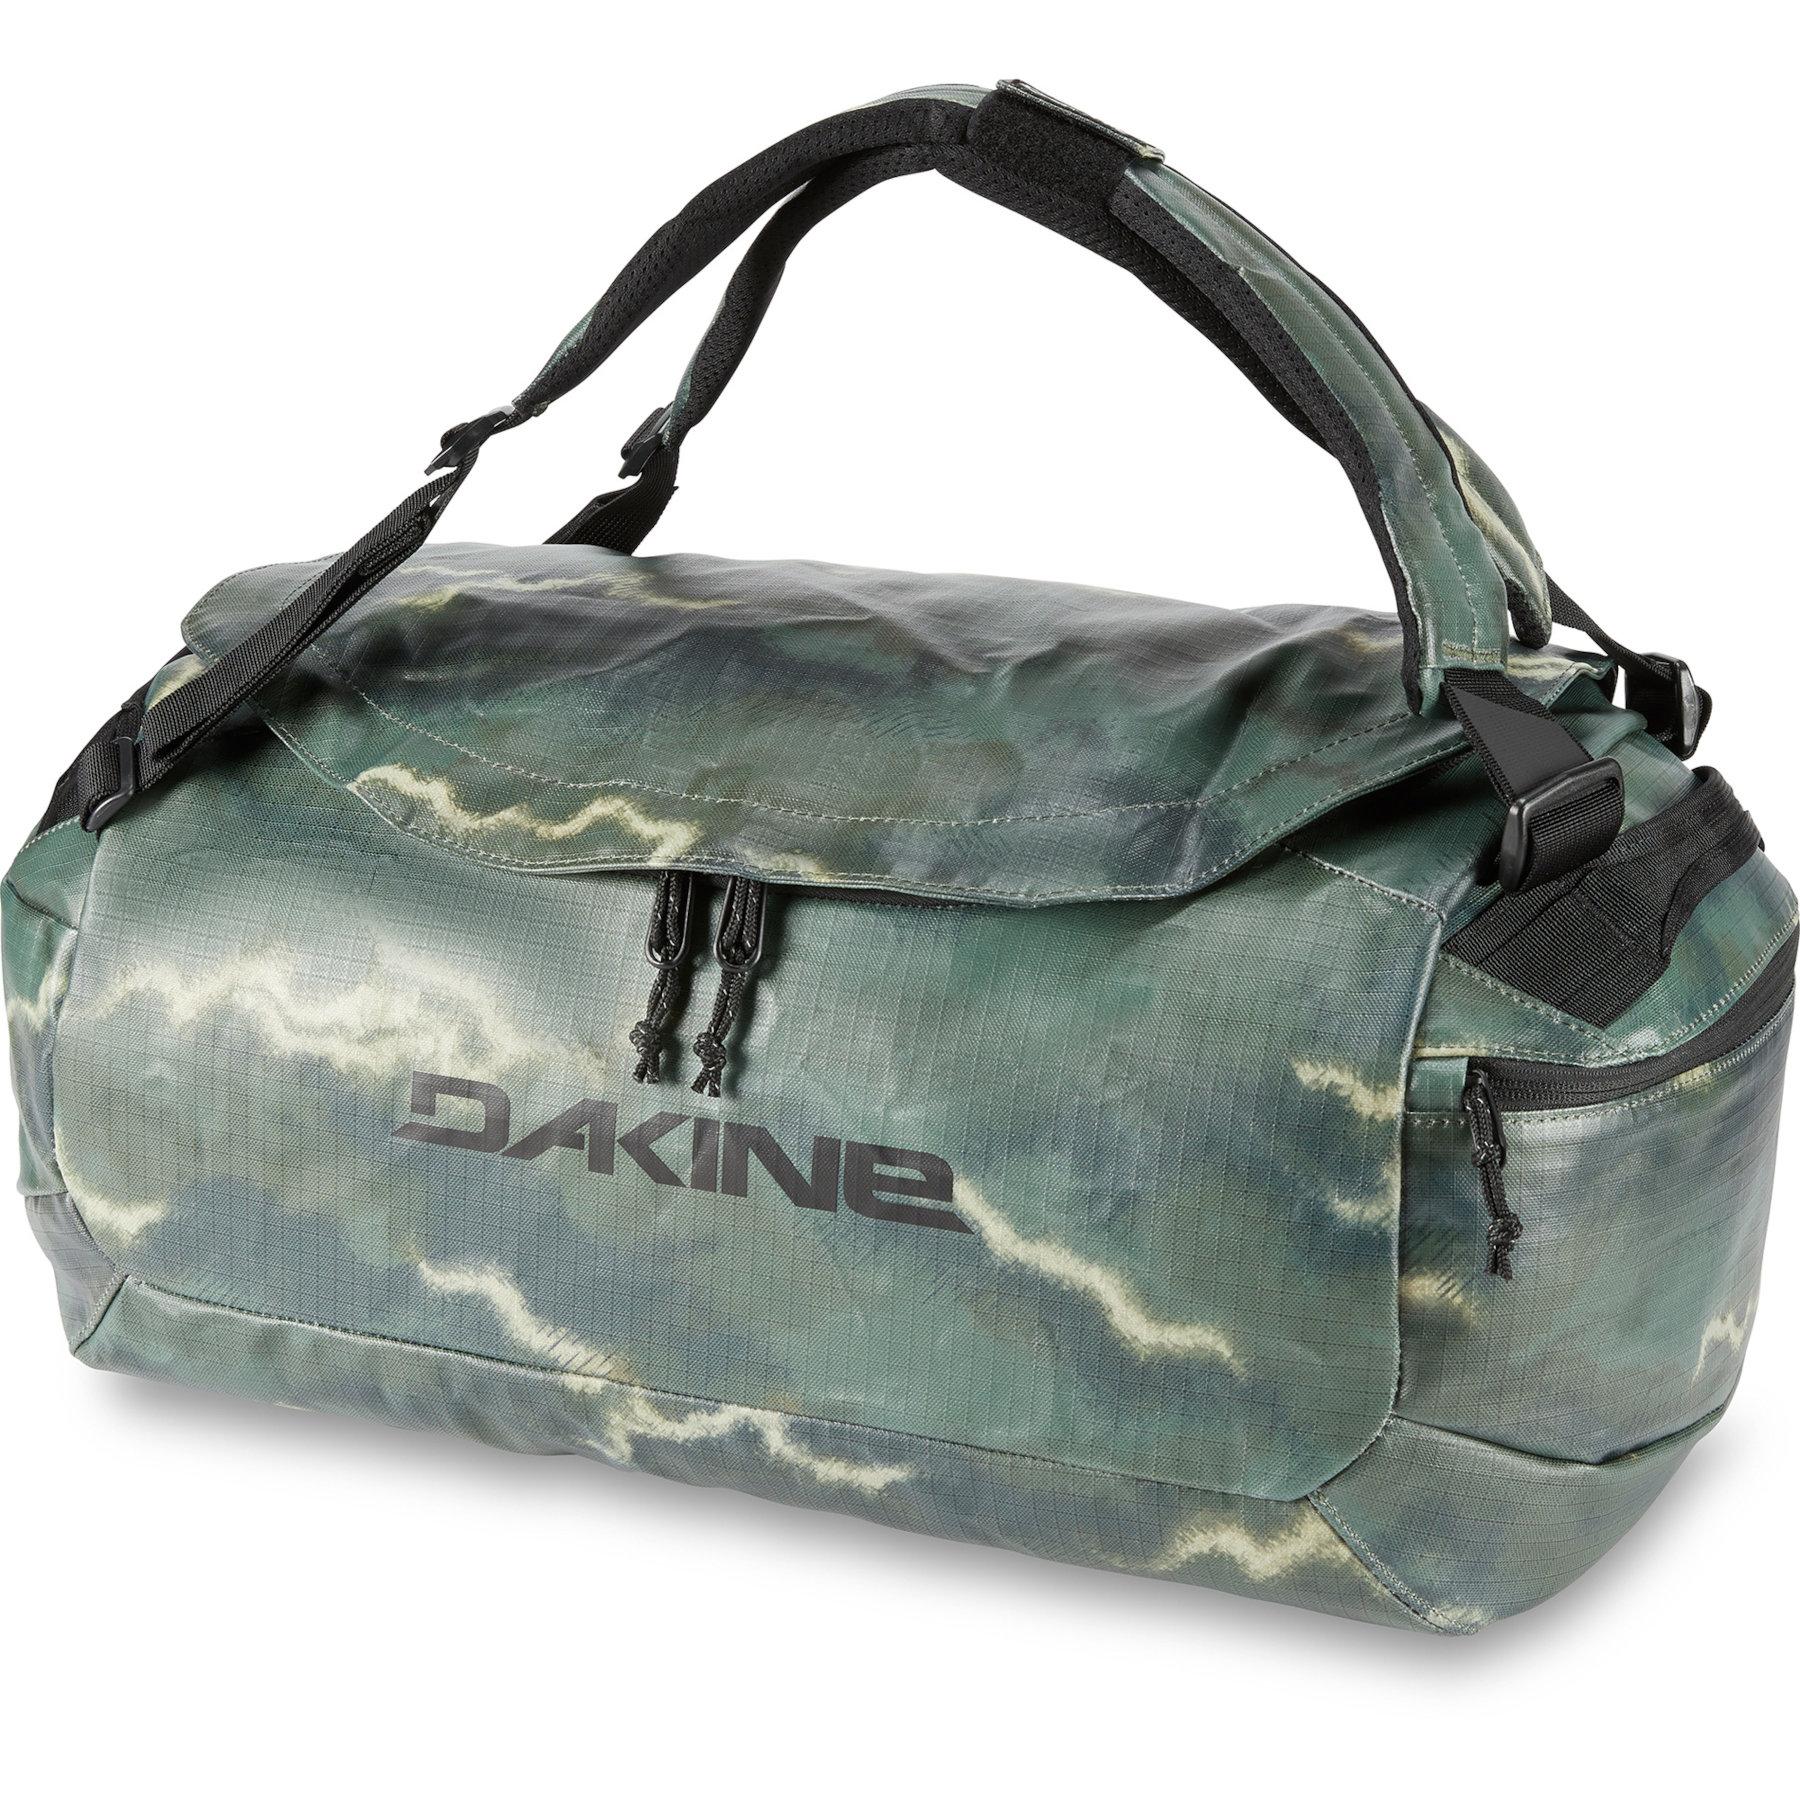 Image of Dakine Ranger Duffle 45L - Olive Ashcroft Camo